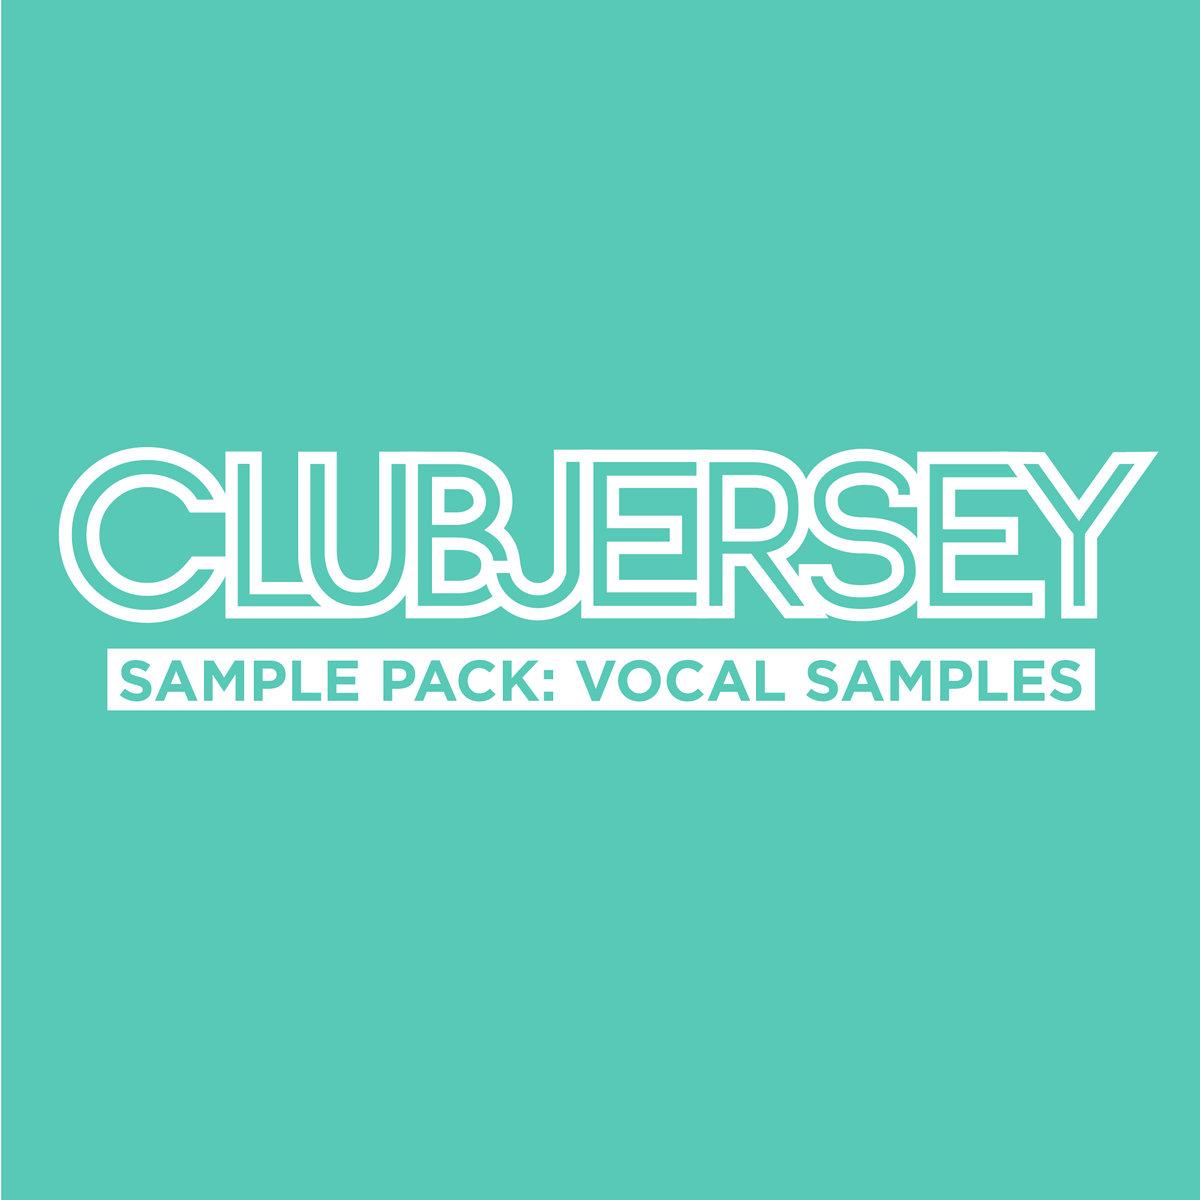 Sample Pack: Vocal Samples | CLUBJERSEYLABEL